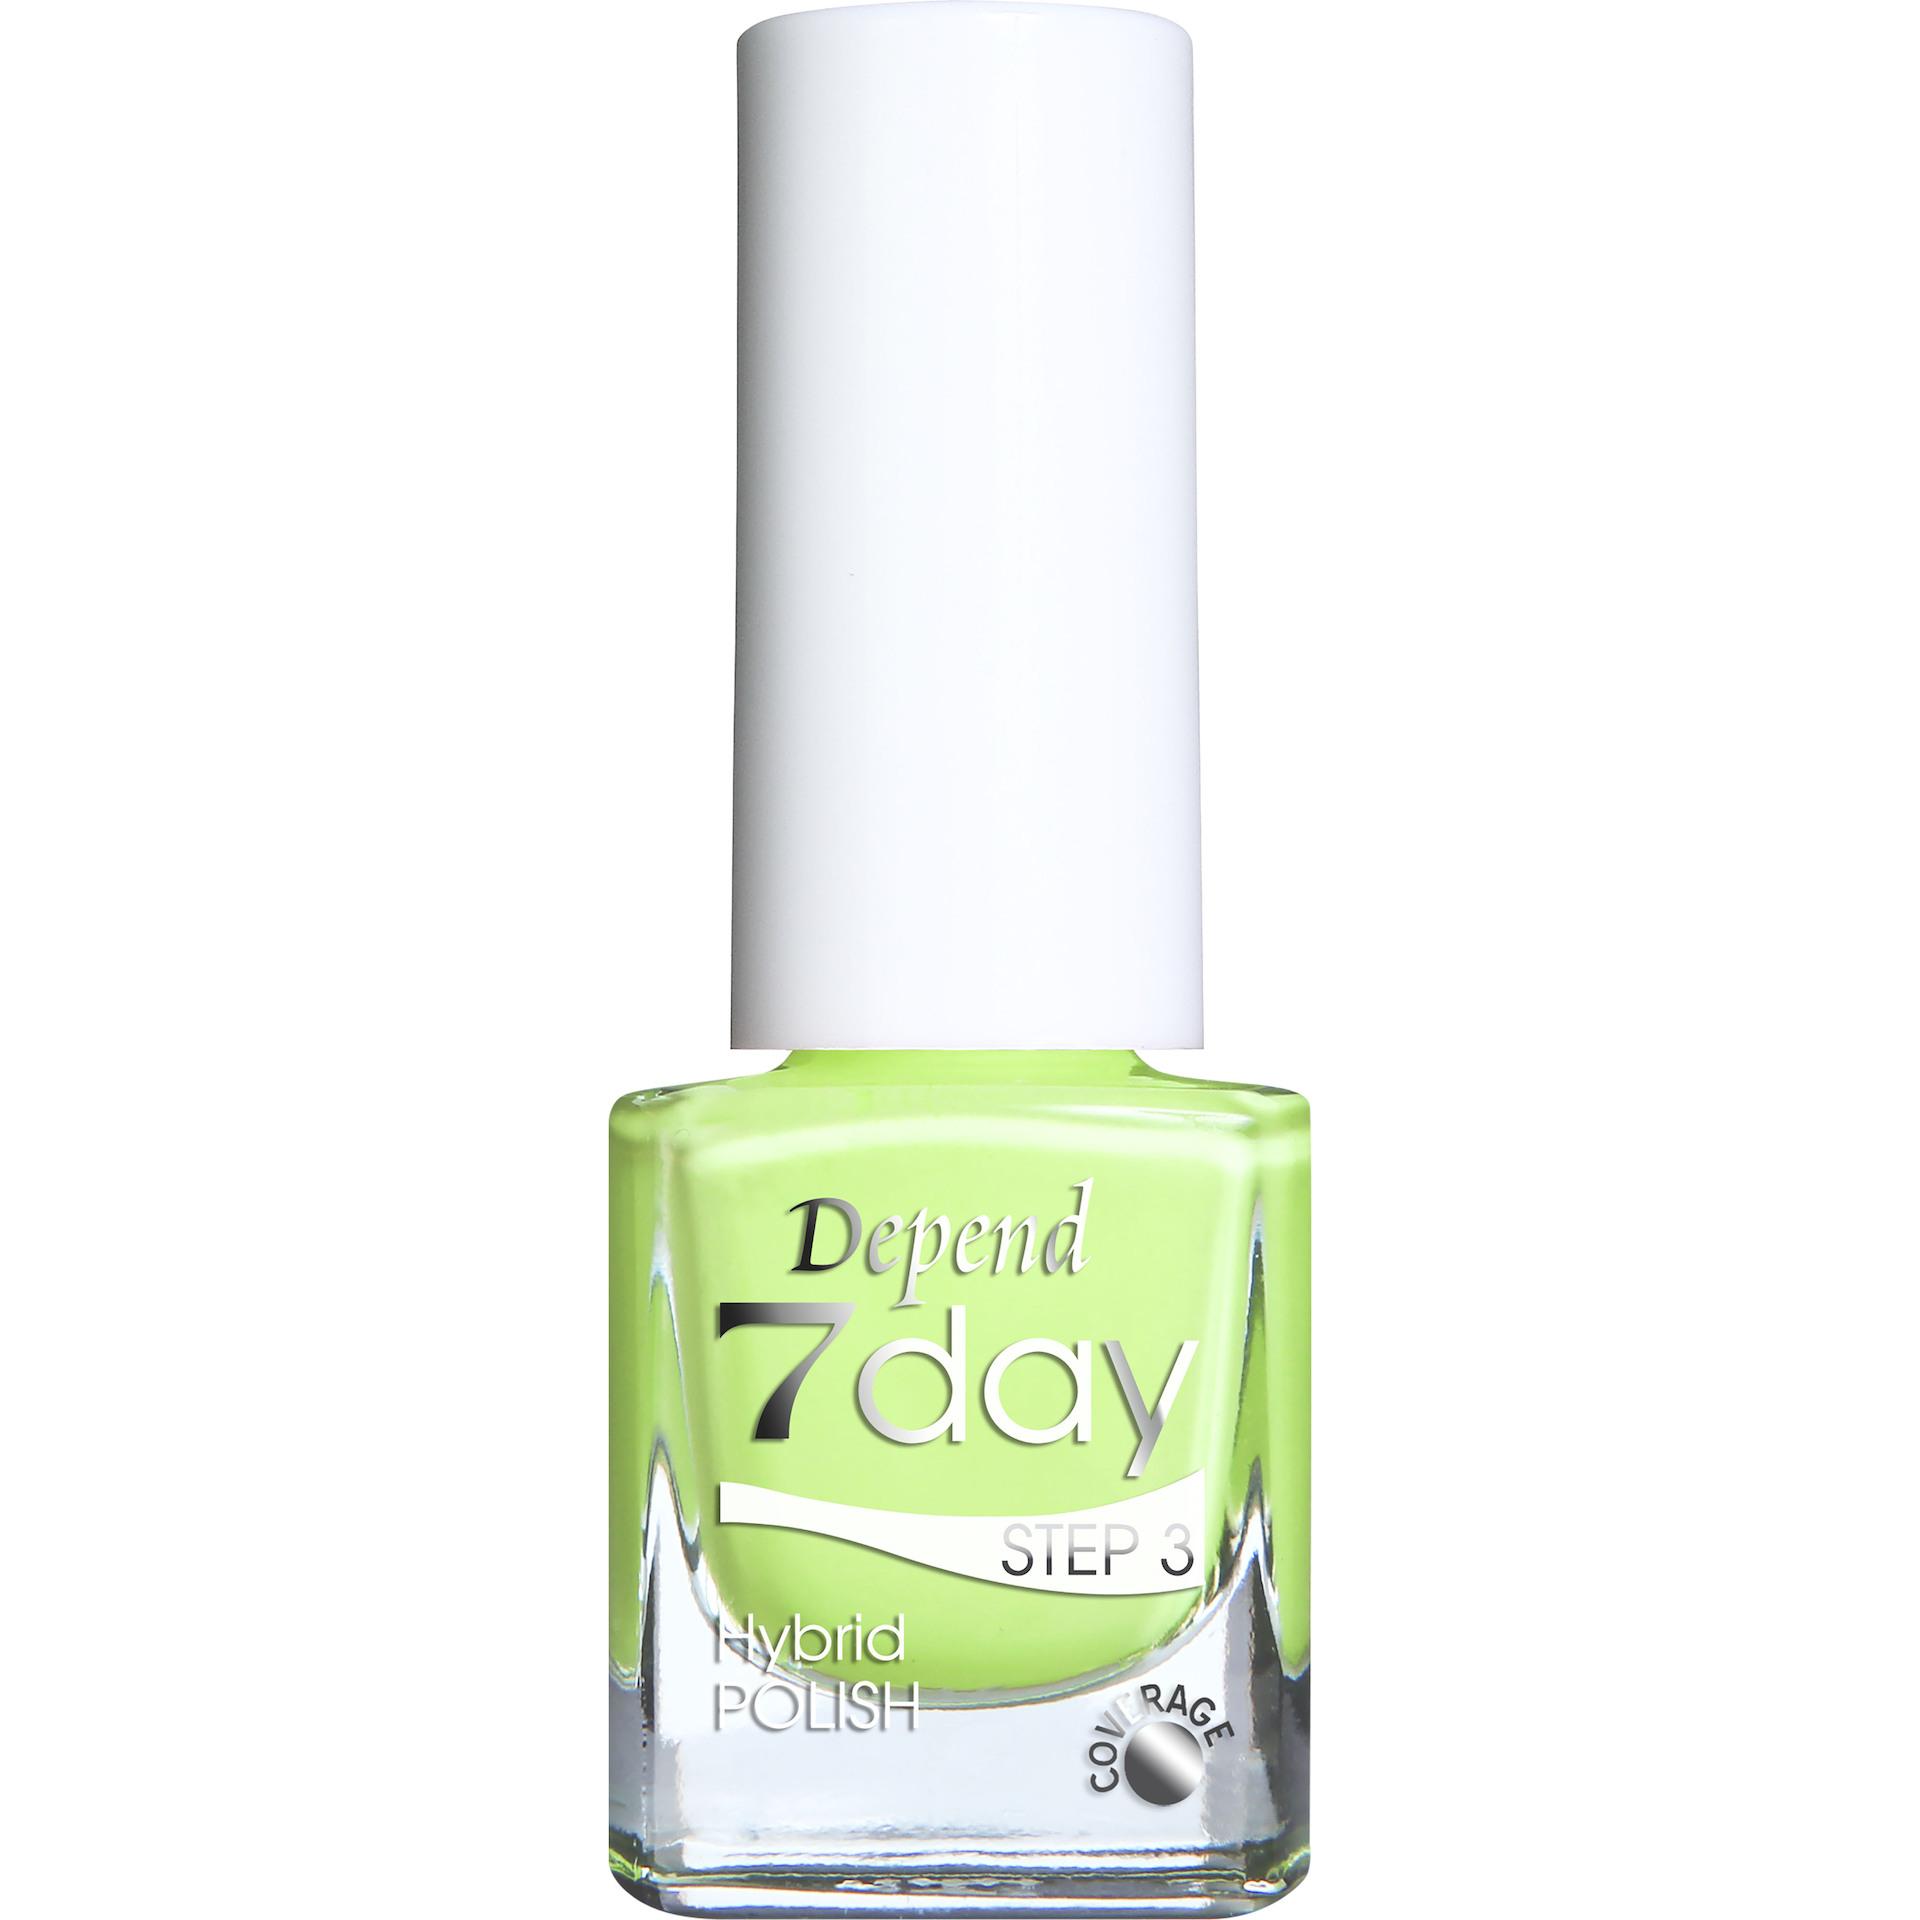 7 Day Hybrid Nail Polish Neon Motion Depend KICKS